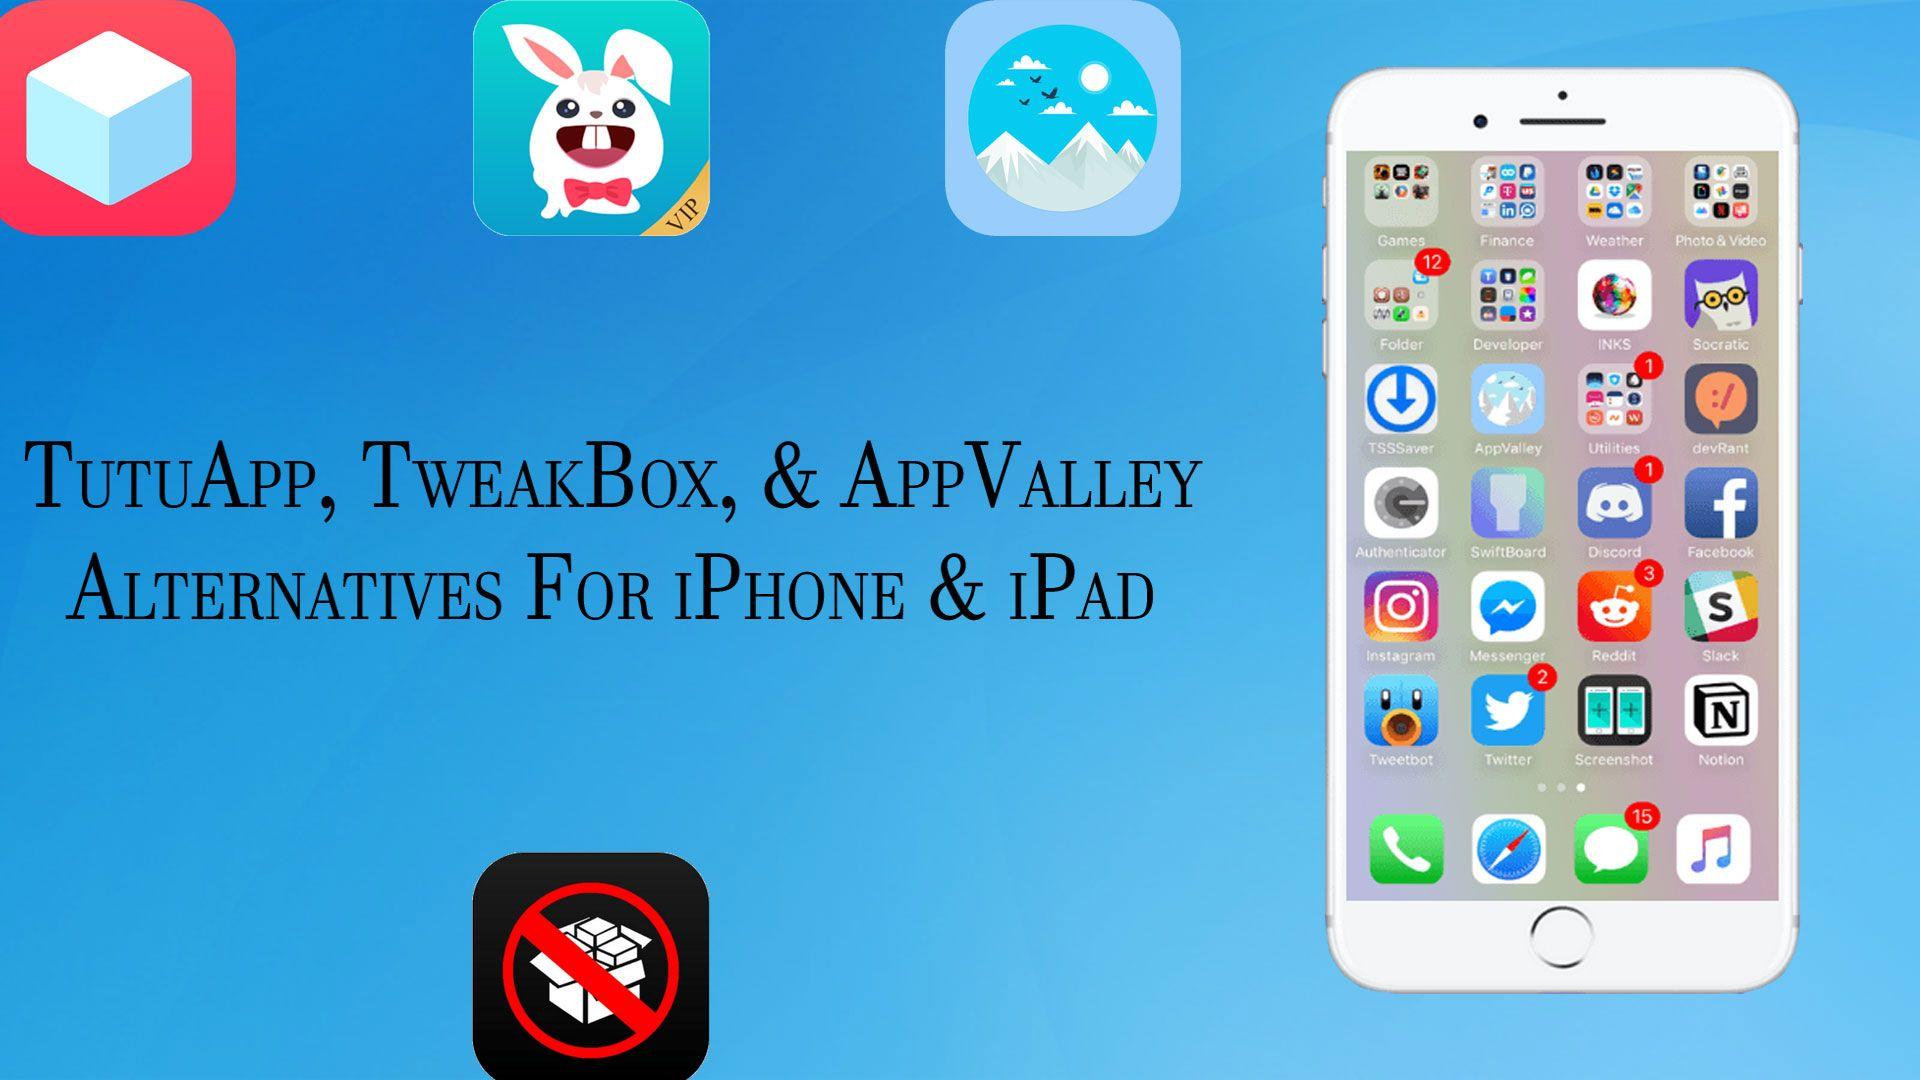 TutuApp, AppValley, & TweakBox alternatives for iPhone